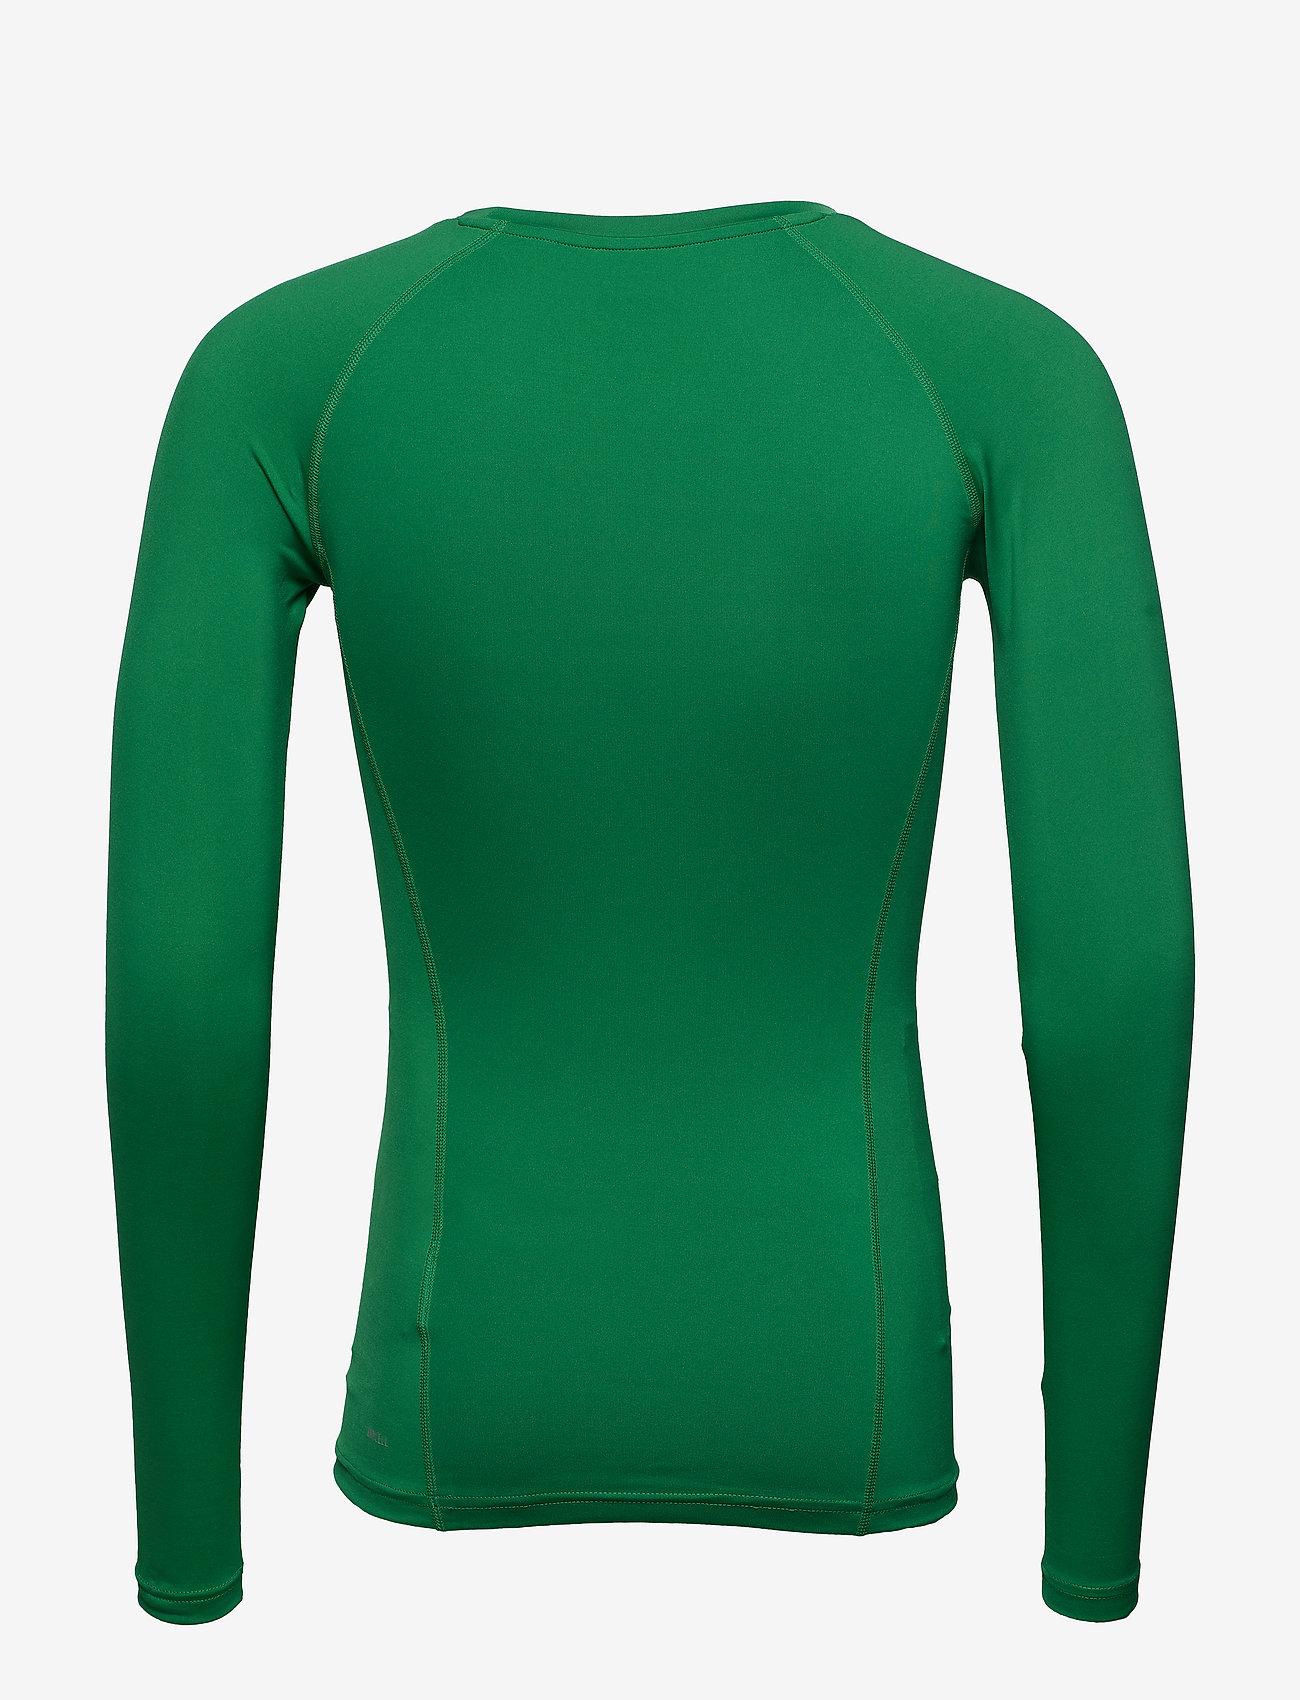 PUMA - LIGA Baselayer Tee LS - football shirts - pepper green - 1